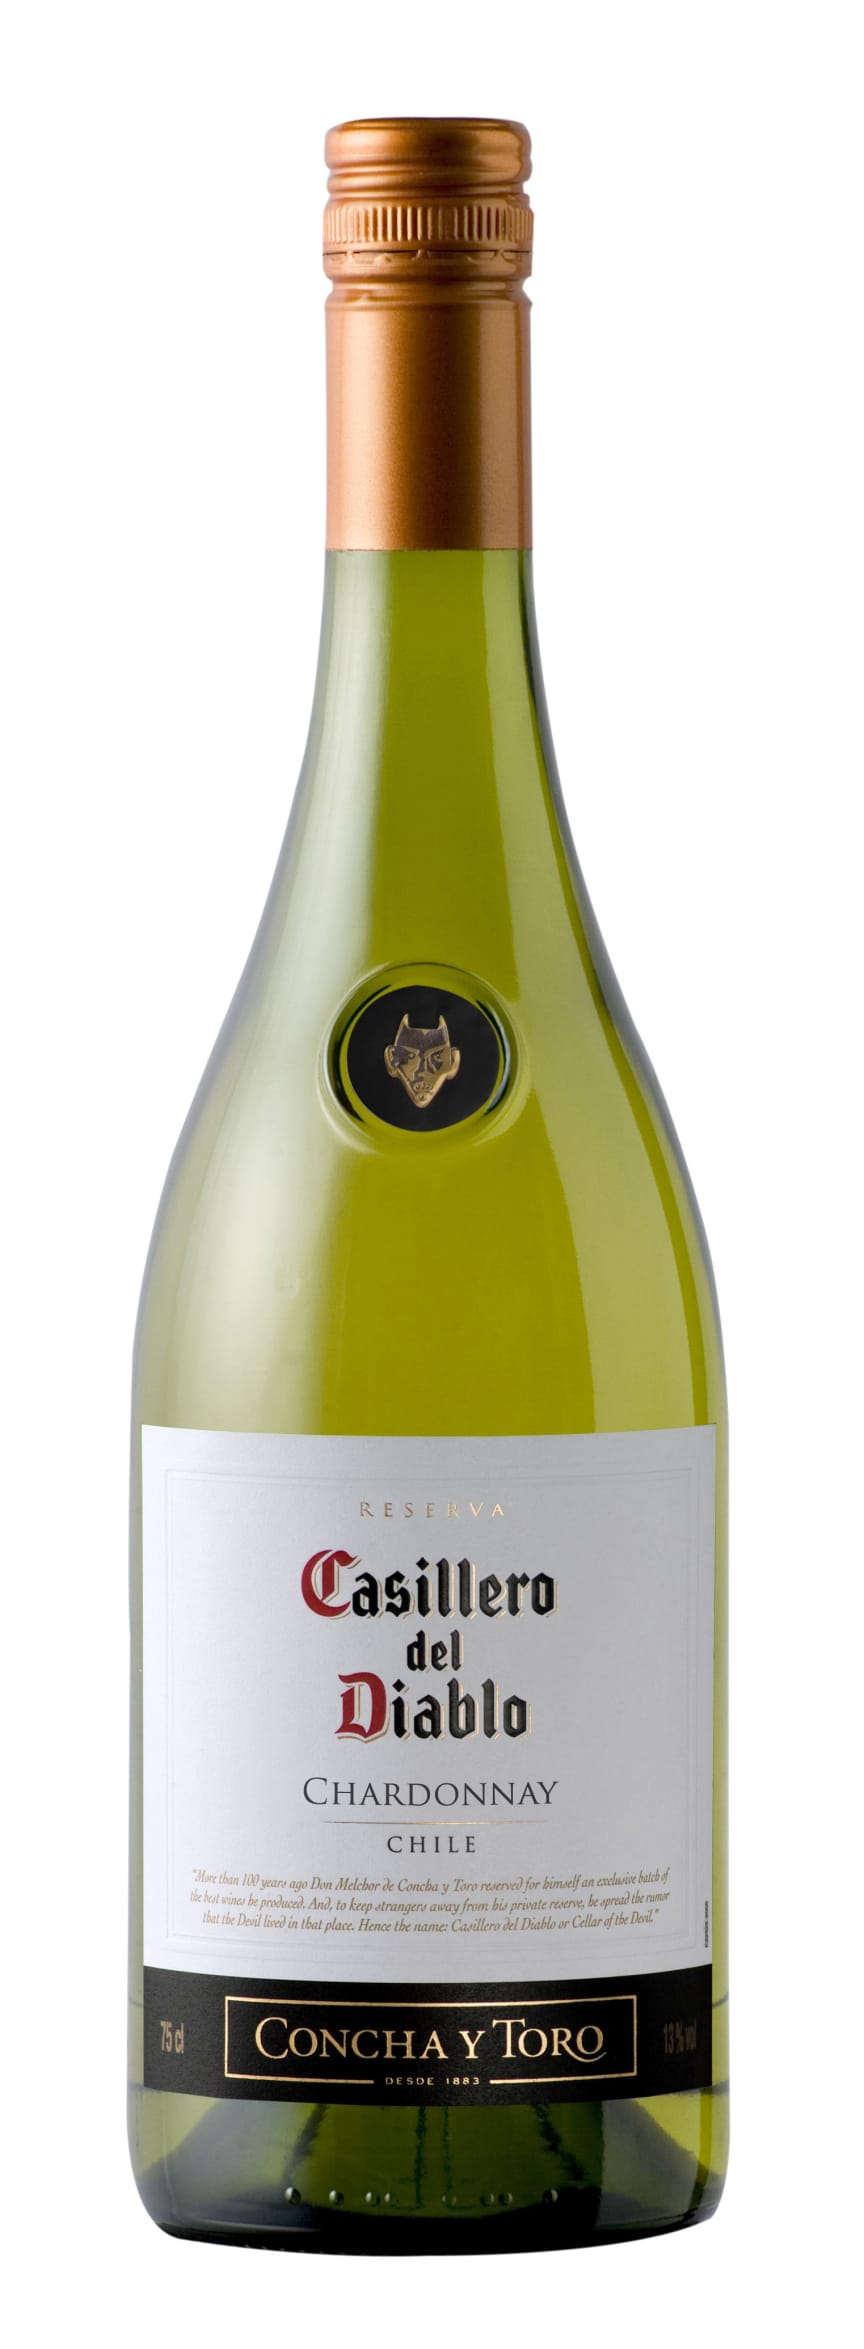 Casillero del Diablo Chardonnay, Chile (nr 207501) 750 ml